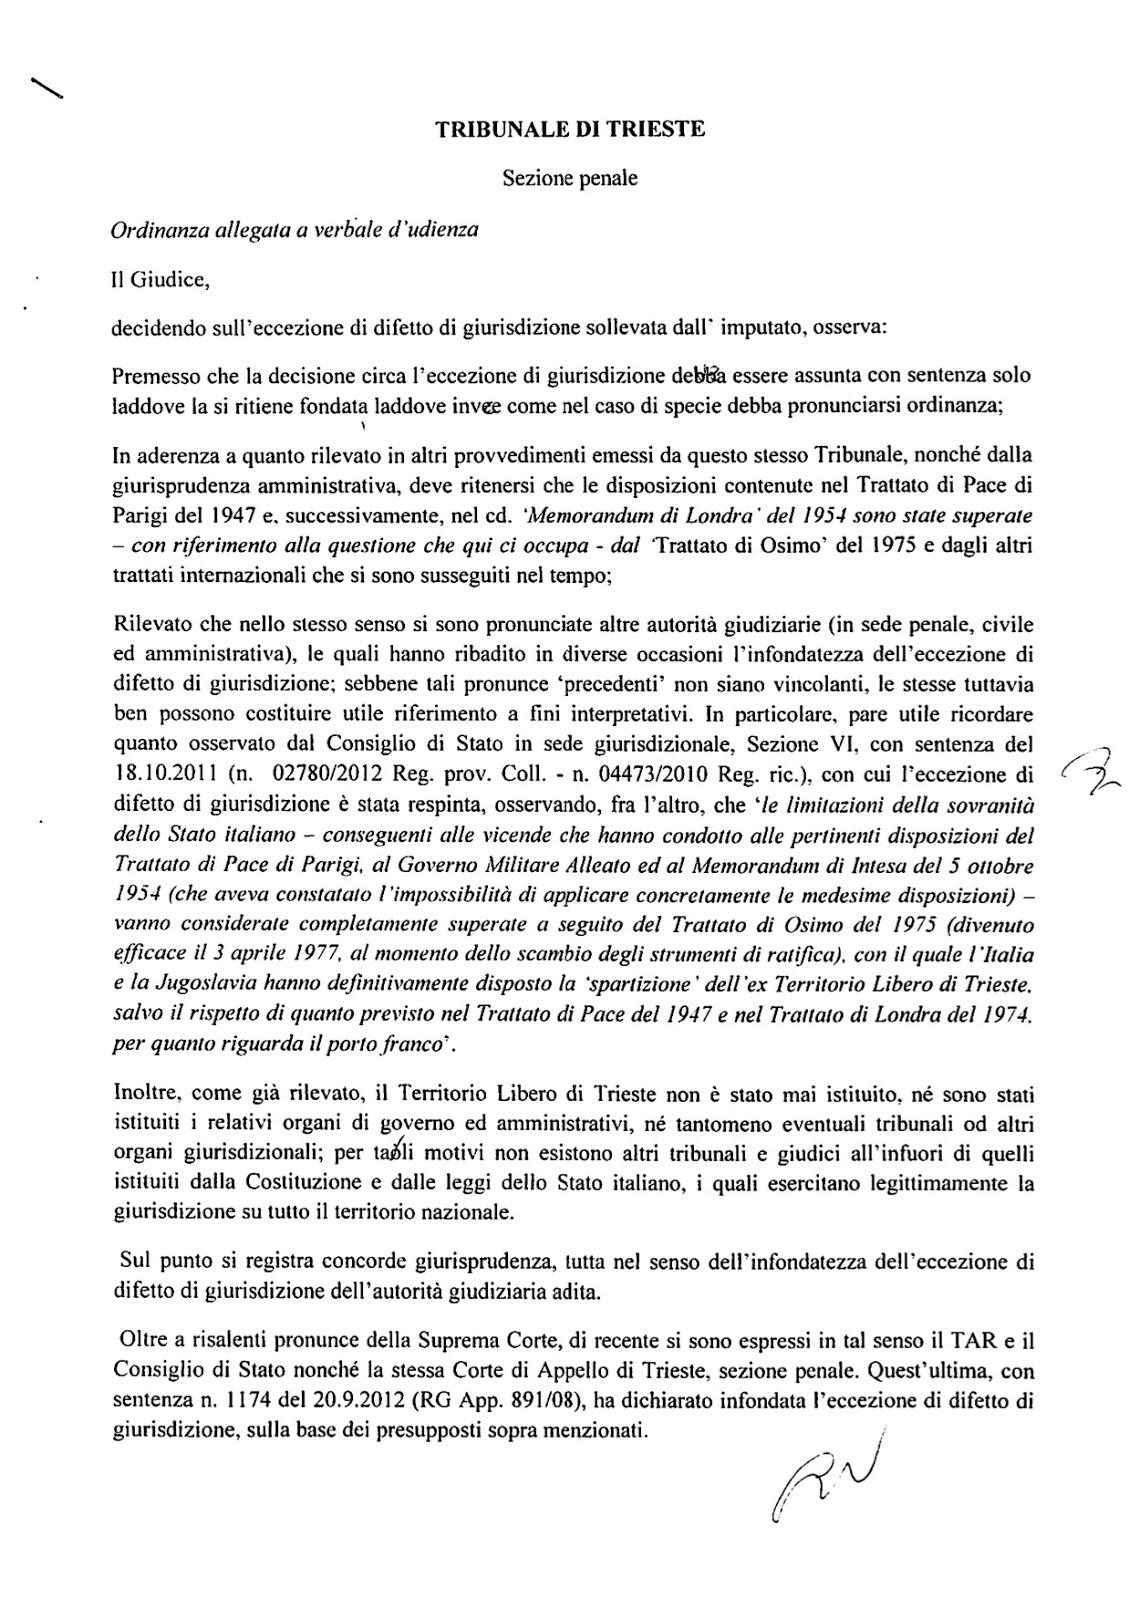 ordinanza_23.12.15_tlt